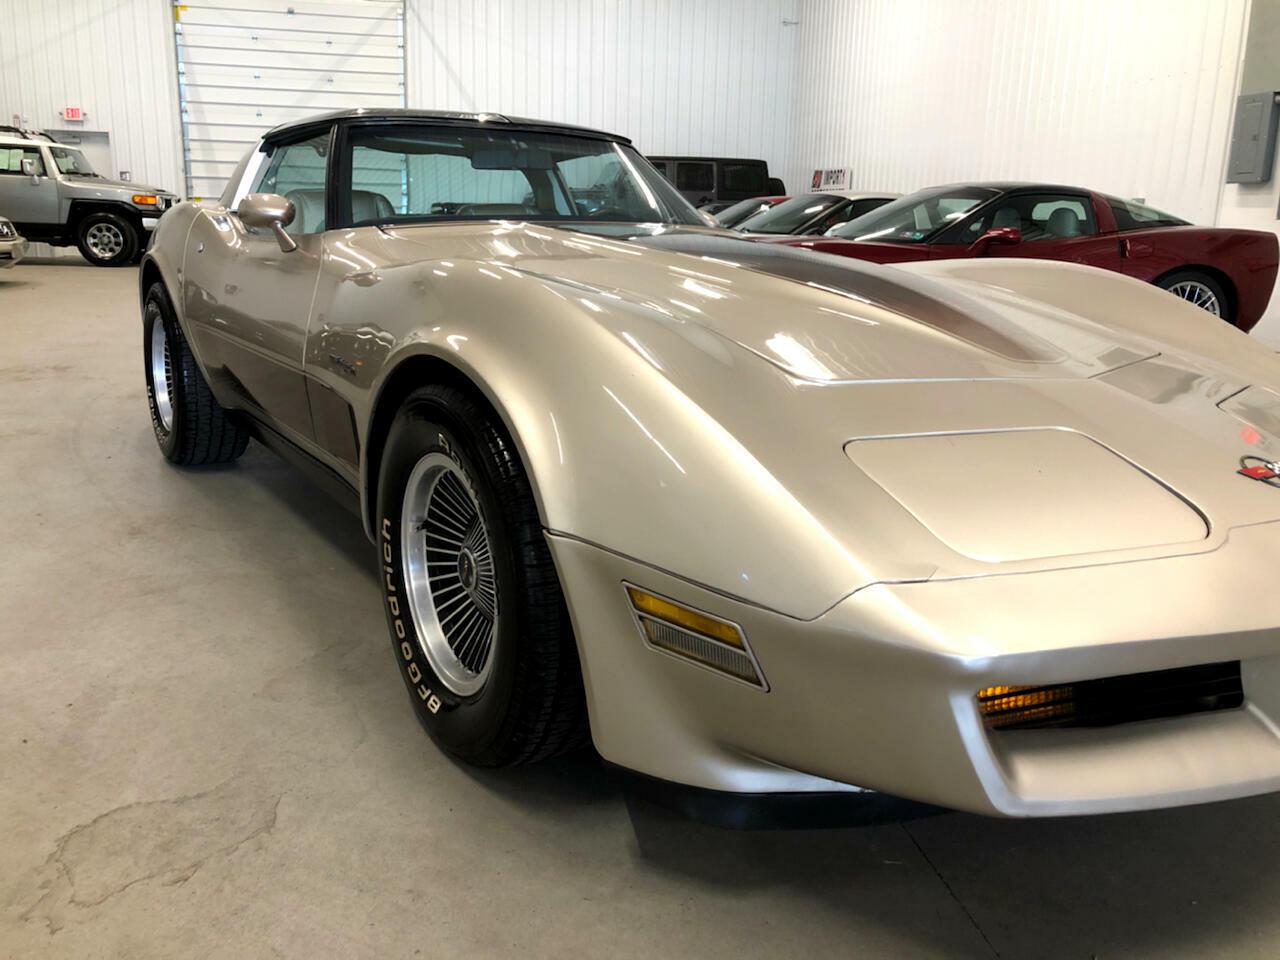 1982 Silver Chevrolet Corvette     C3 Corvette Photo 5